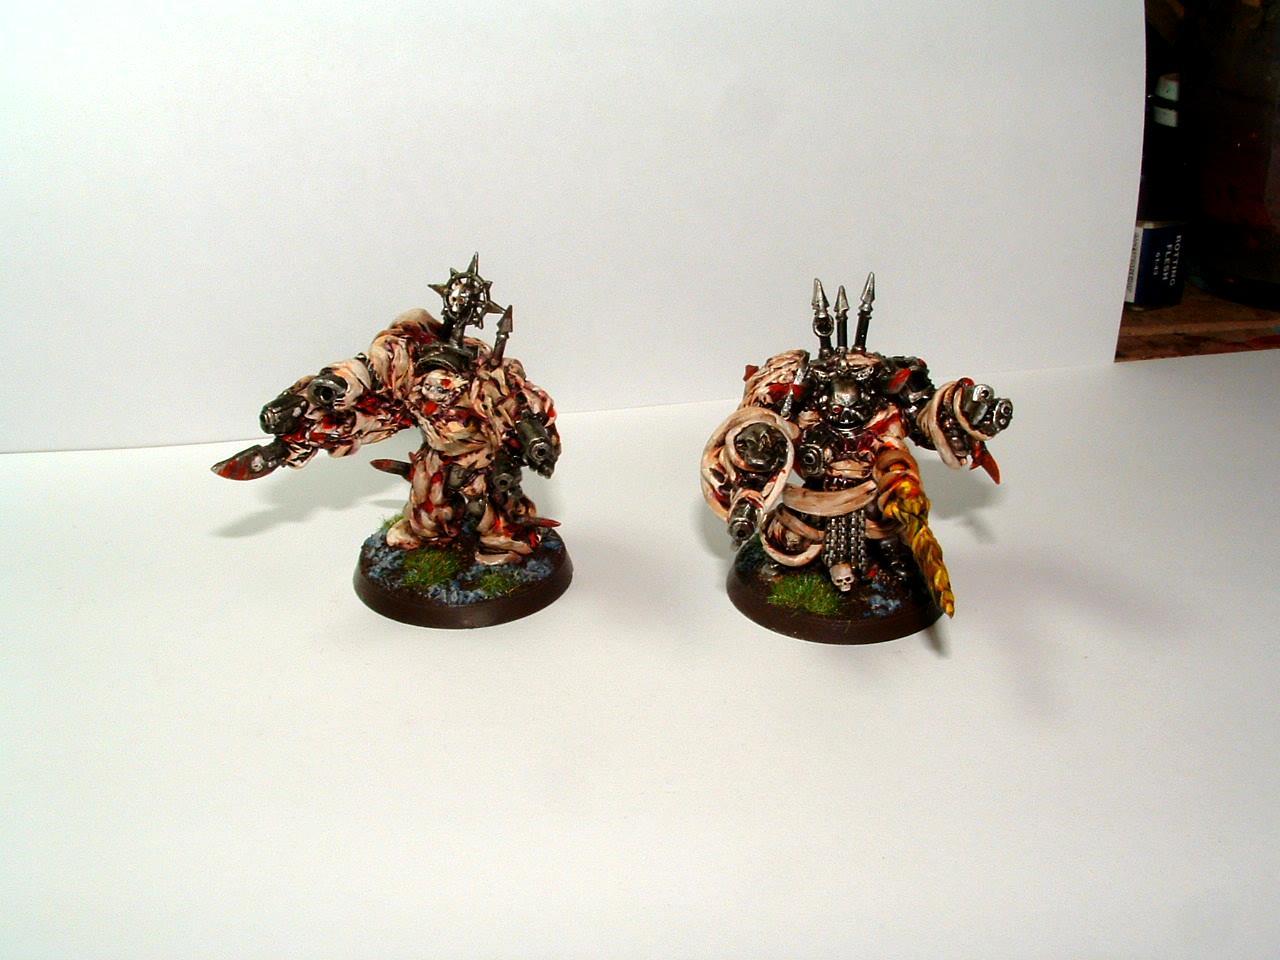 Chaos Space Marines, Obilitorators, Warhammer 40,000